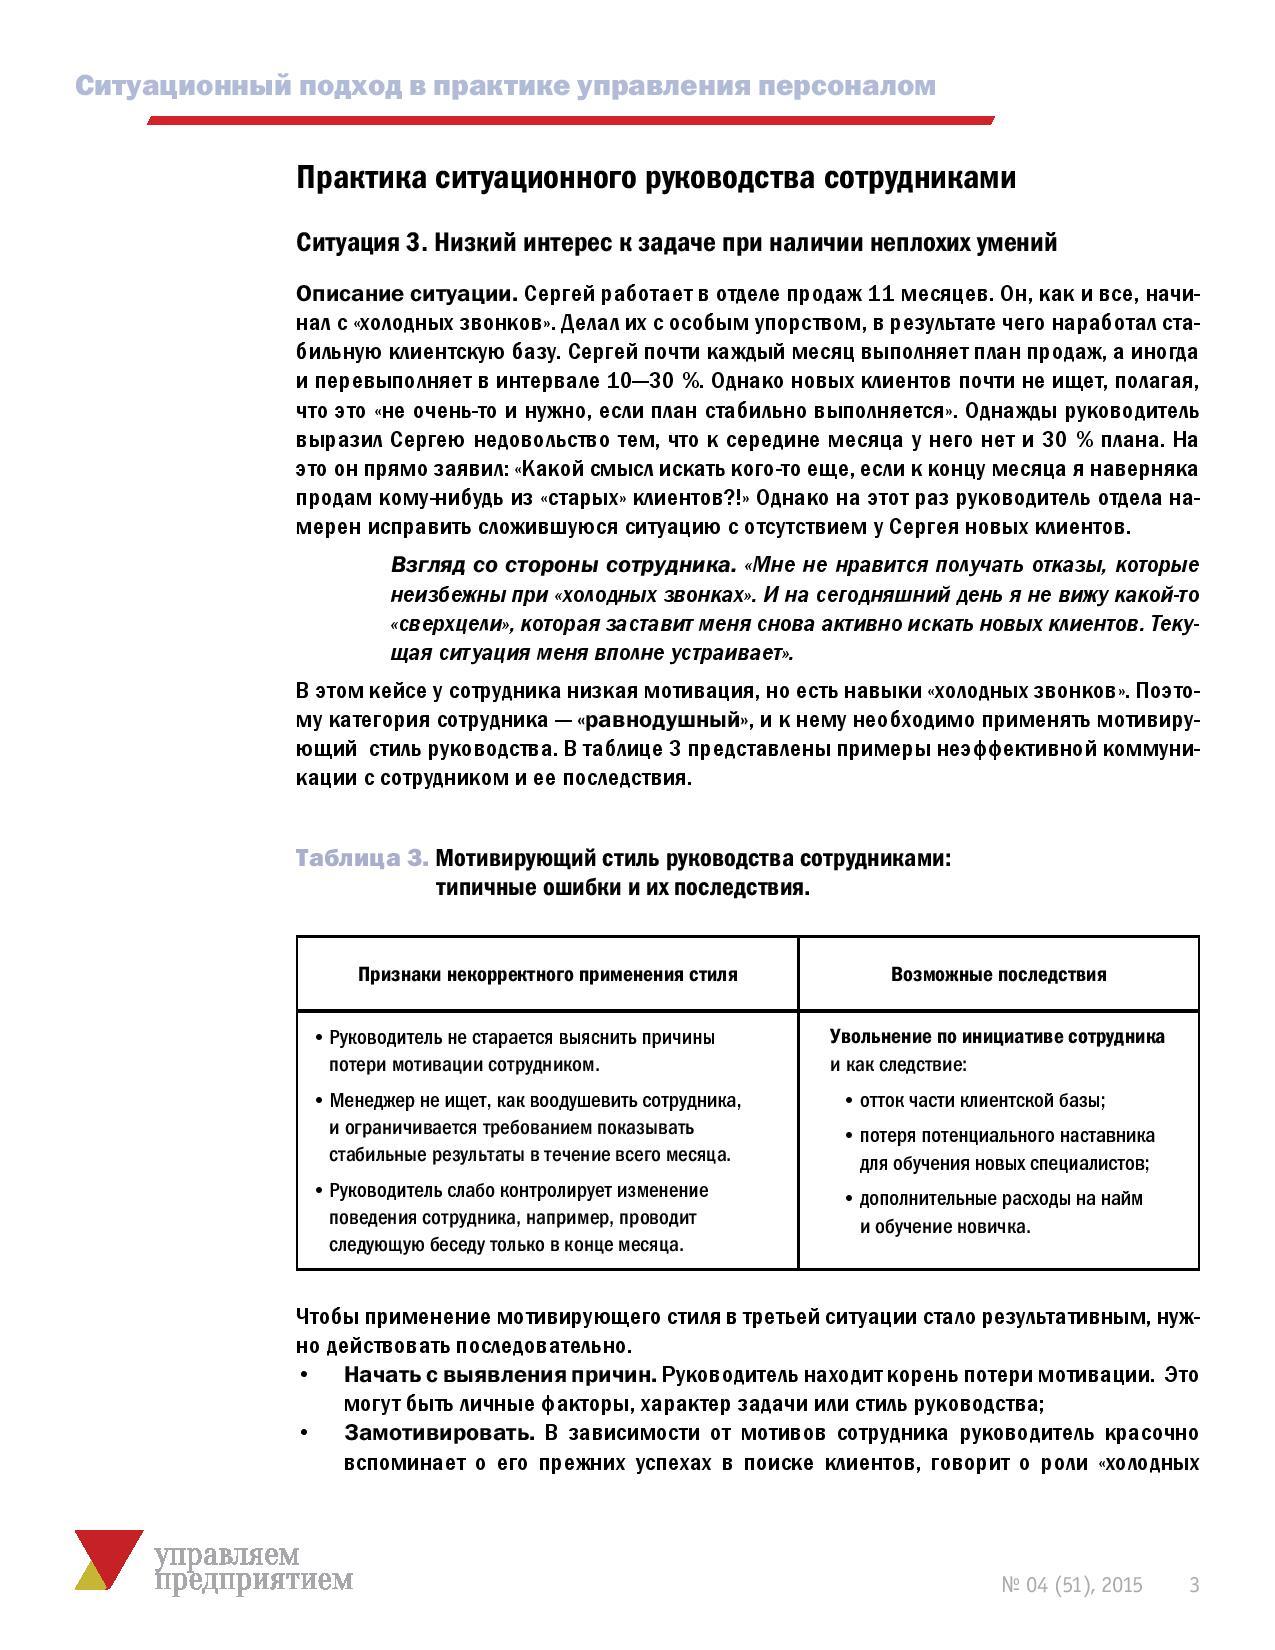 Situacionnyy_podhod_Cast__2._Upravlaem_predpriatiem__04_2015-page-003